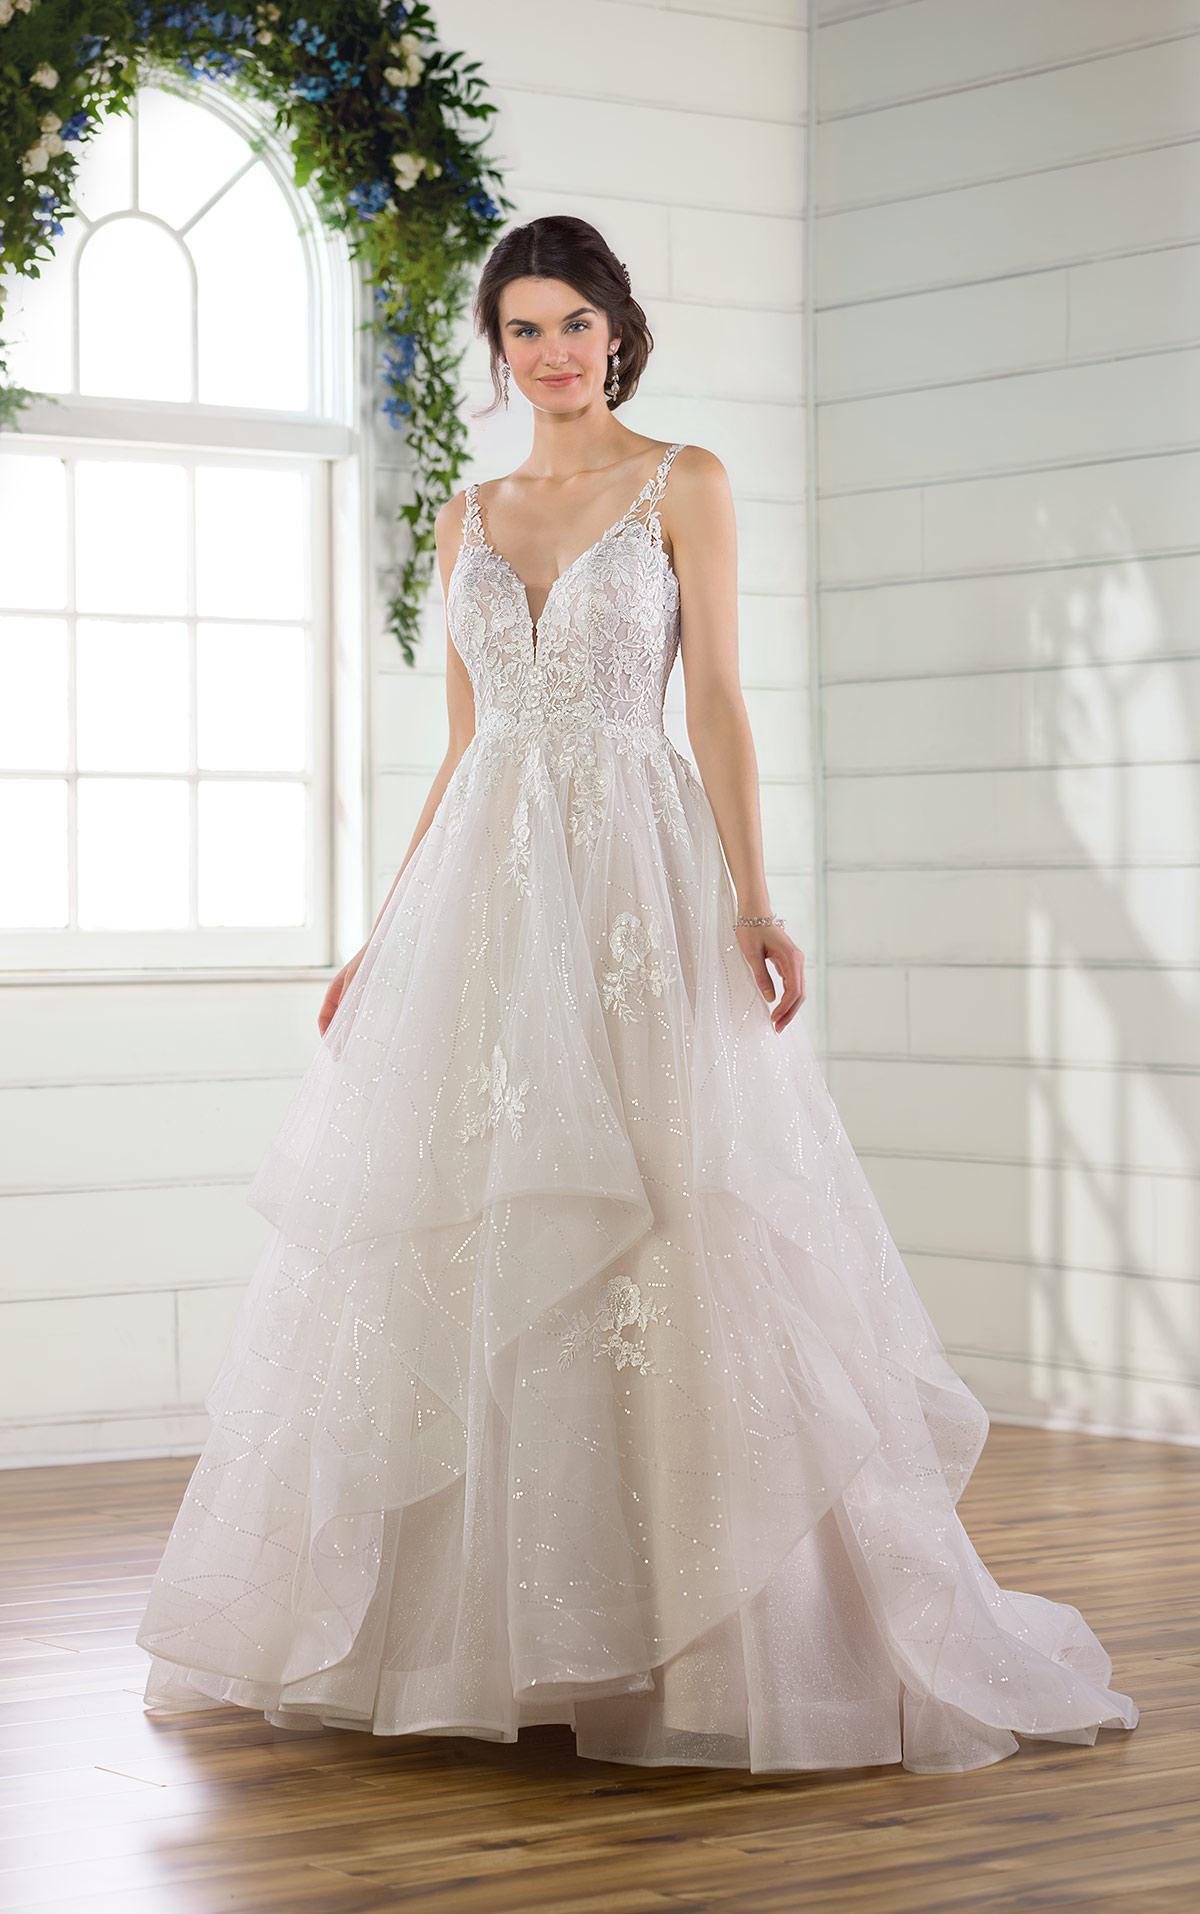 Sleeveless Glitter Ball Gown Wedding Dress With Tiered Skirt Kleinfeld Bridal,Wedding Dress Washington Dc